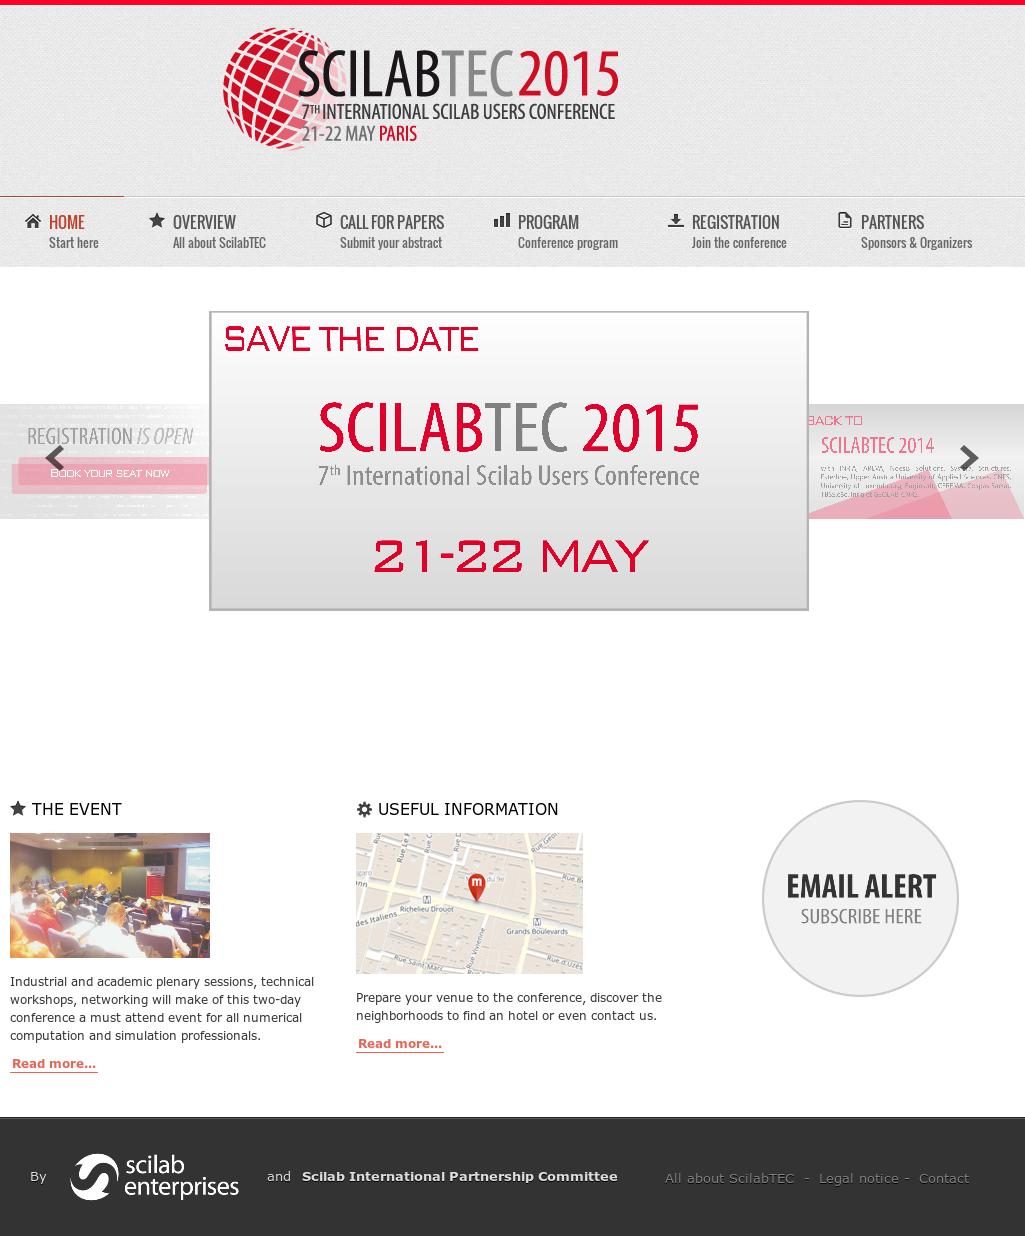 Scilab Enterprises Competitors, Revenue and Employees - Owler